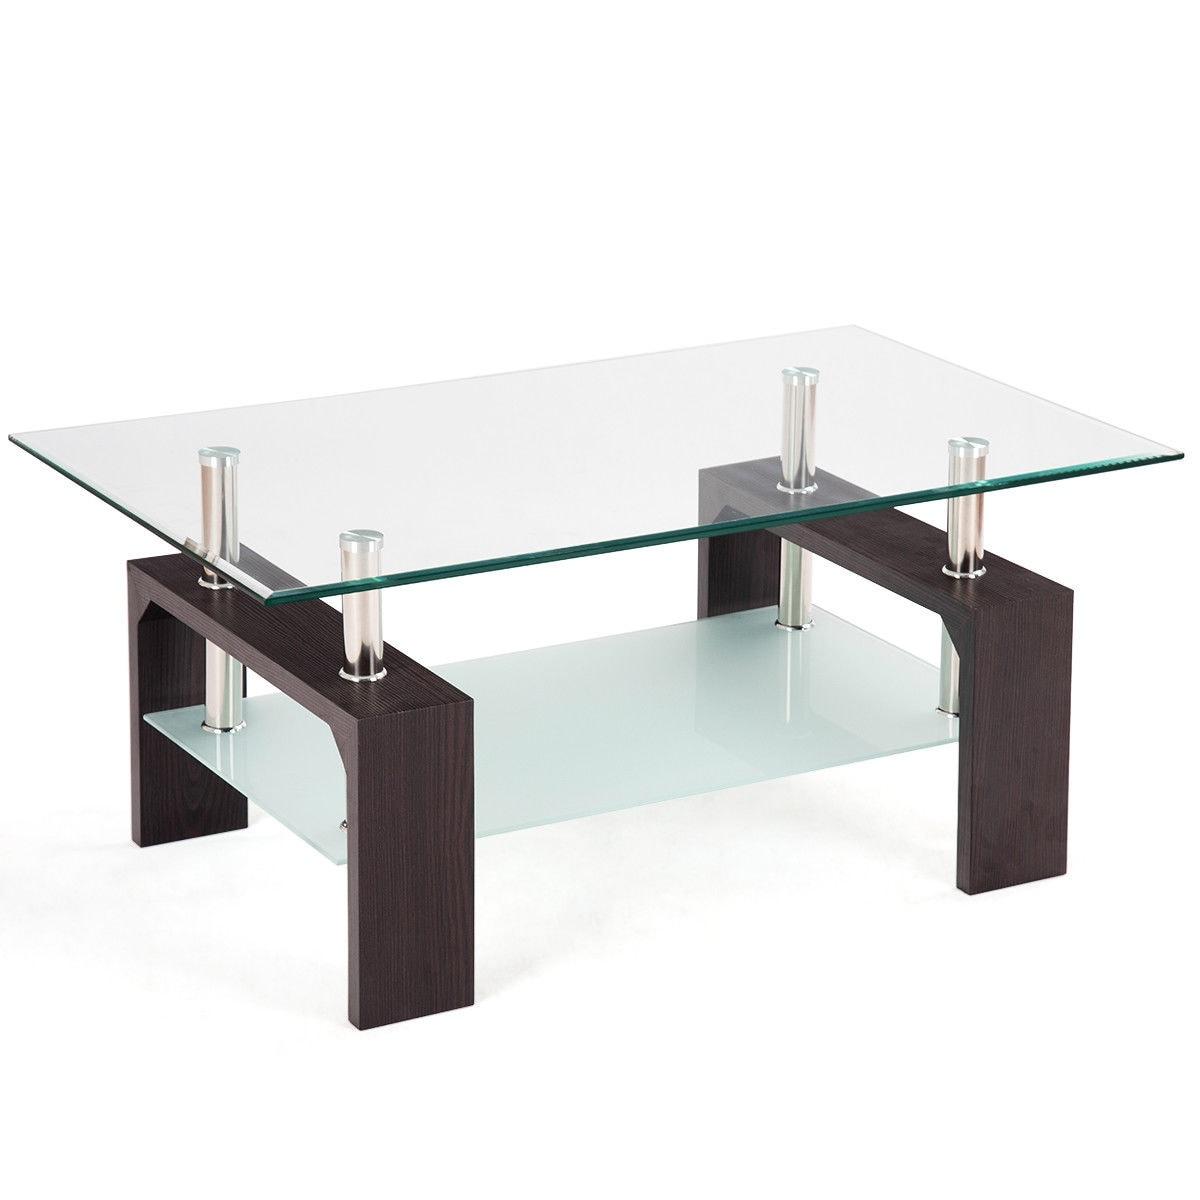 Shop Costway Rectangular Tempered Glass Coffee Table w/Shelf Wood ...